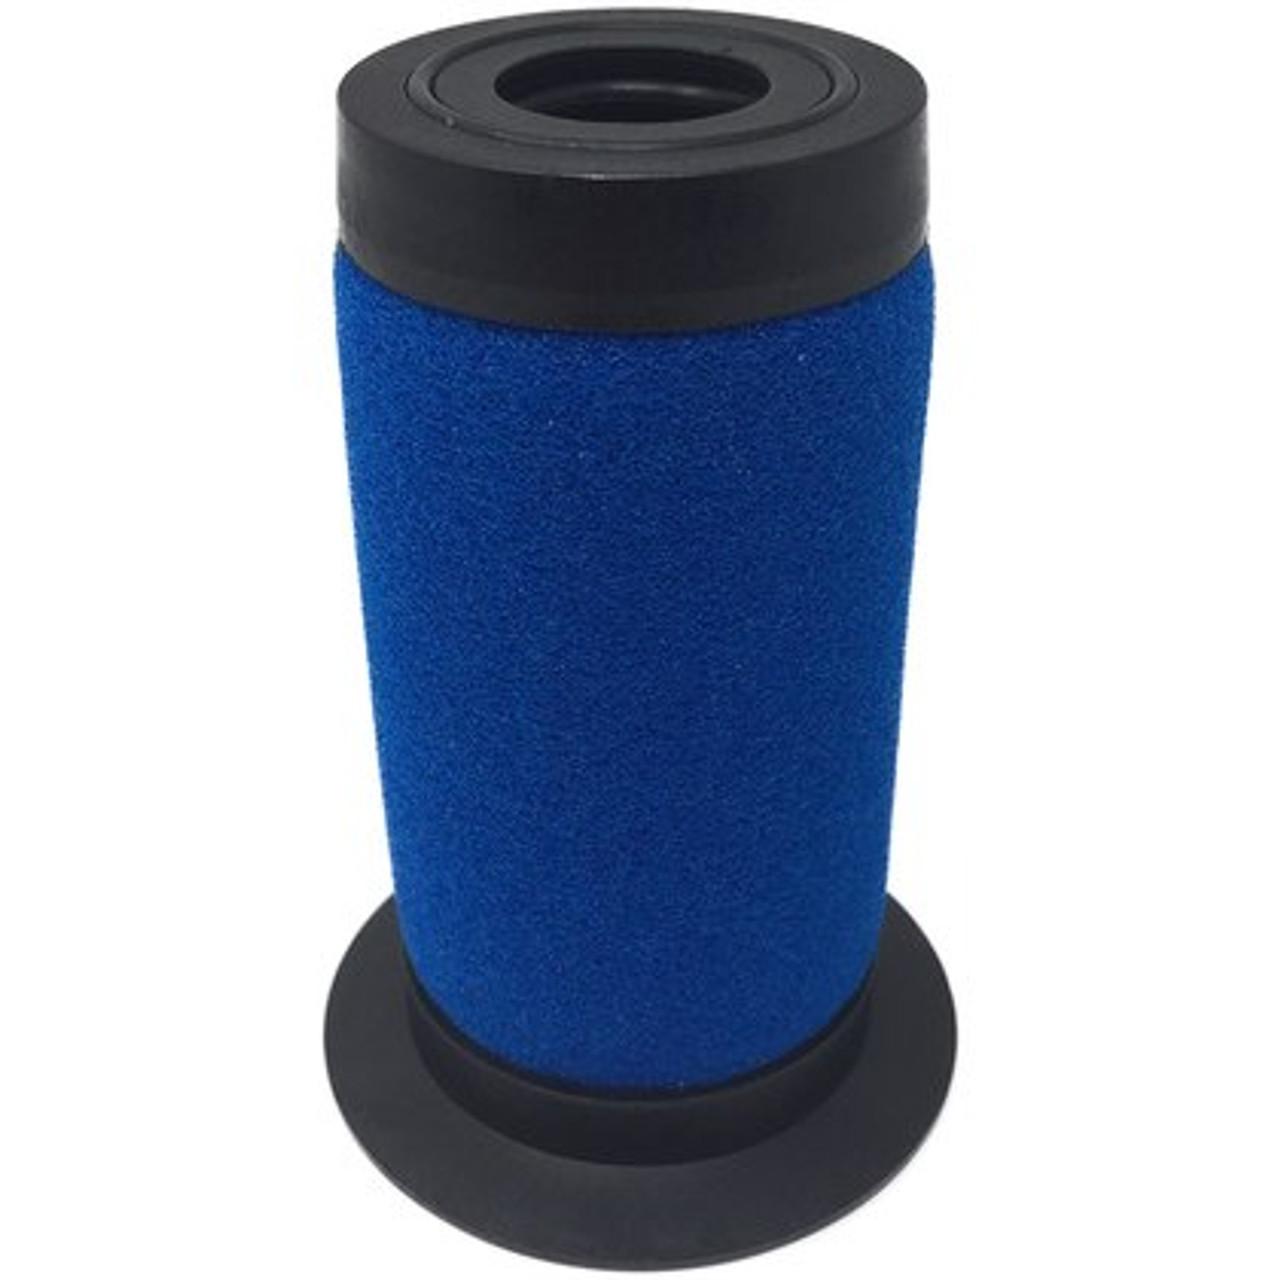 Hankison E9-16-04 Replacement Filter Element OEM Equivalent